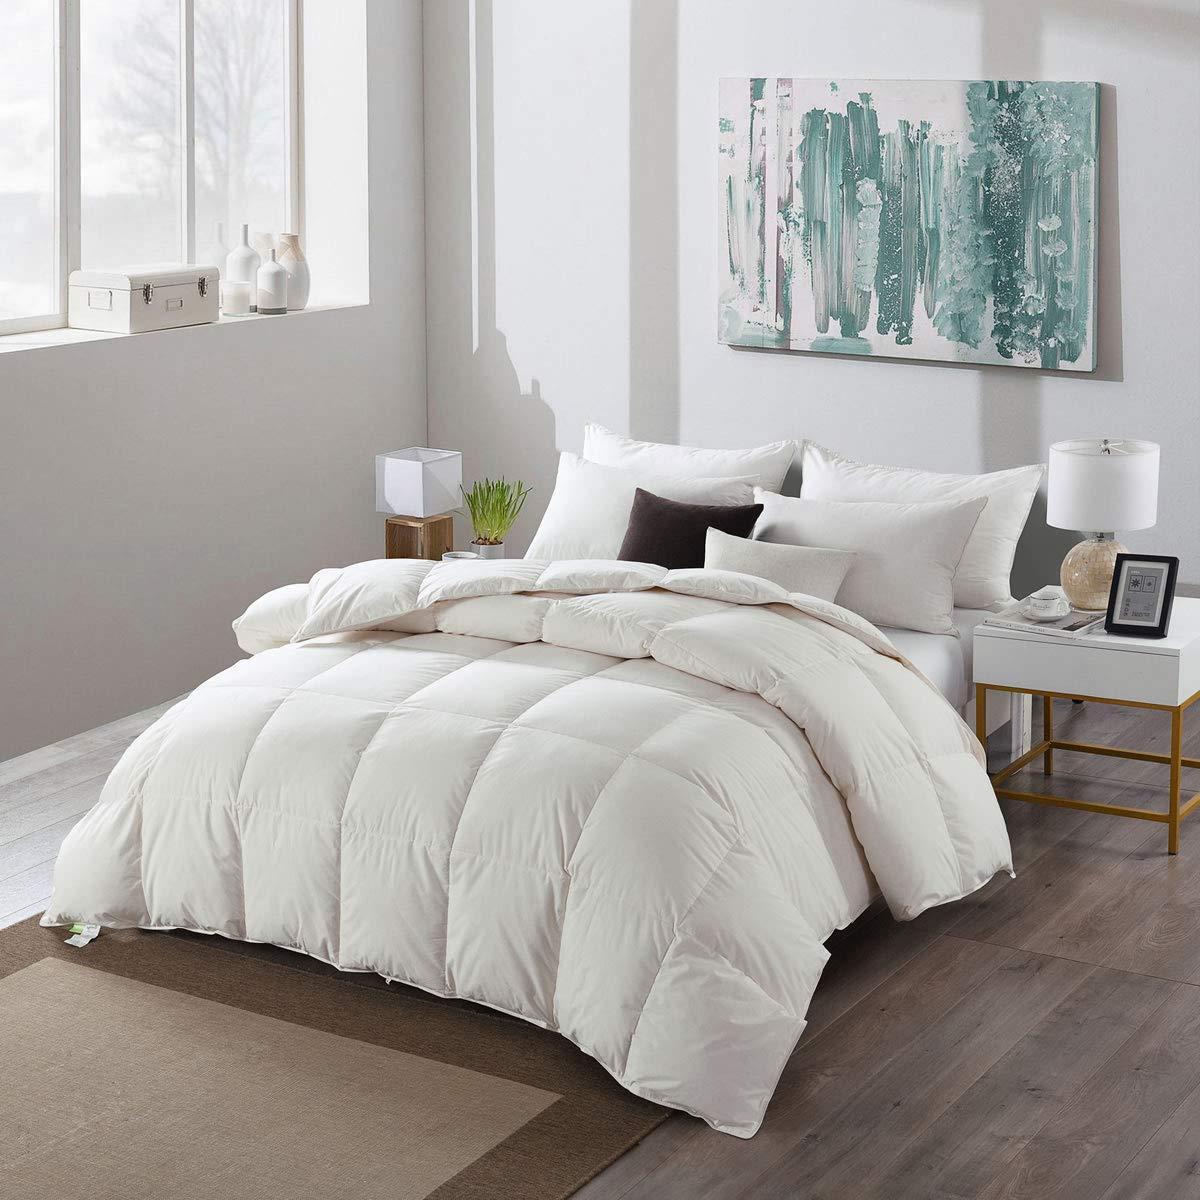 APSMILE Premium Siberian All Season Goose Down Duvet -Comforter Twin -100% Original Cotton Cover, 33 Oz Lightweight Hypoallergenic Duvet Insert(Twin - White) APSMILE Bedding